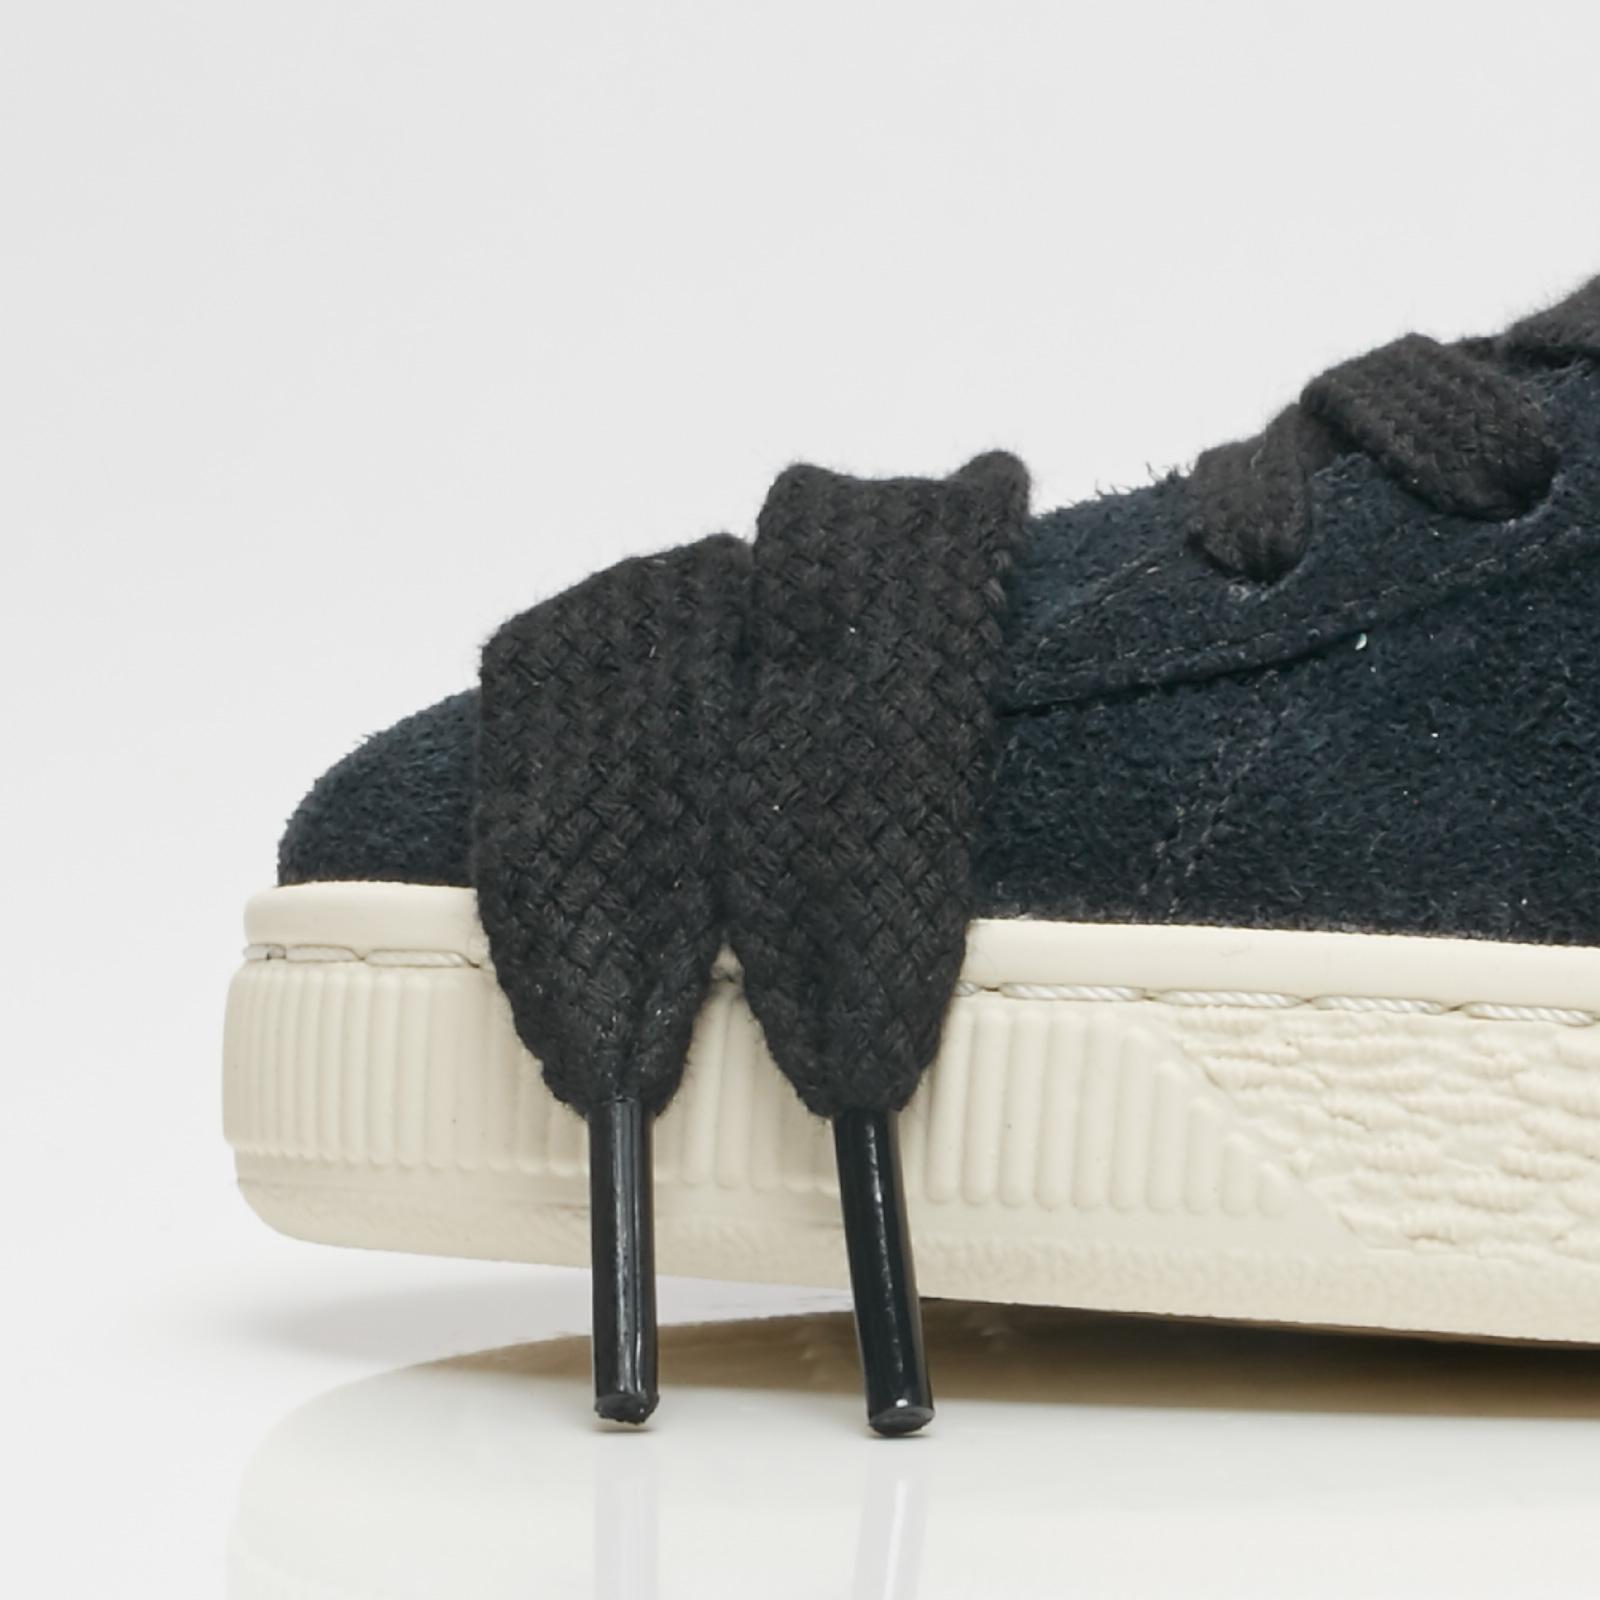 Puma Suede Classic Rudolf Dassler - 366170-01 - Sneakersnstuff ... 5f90151ba